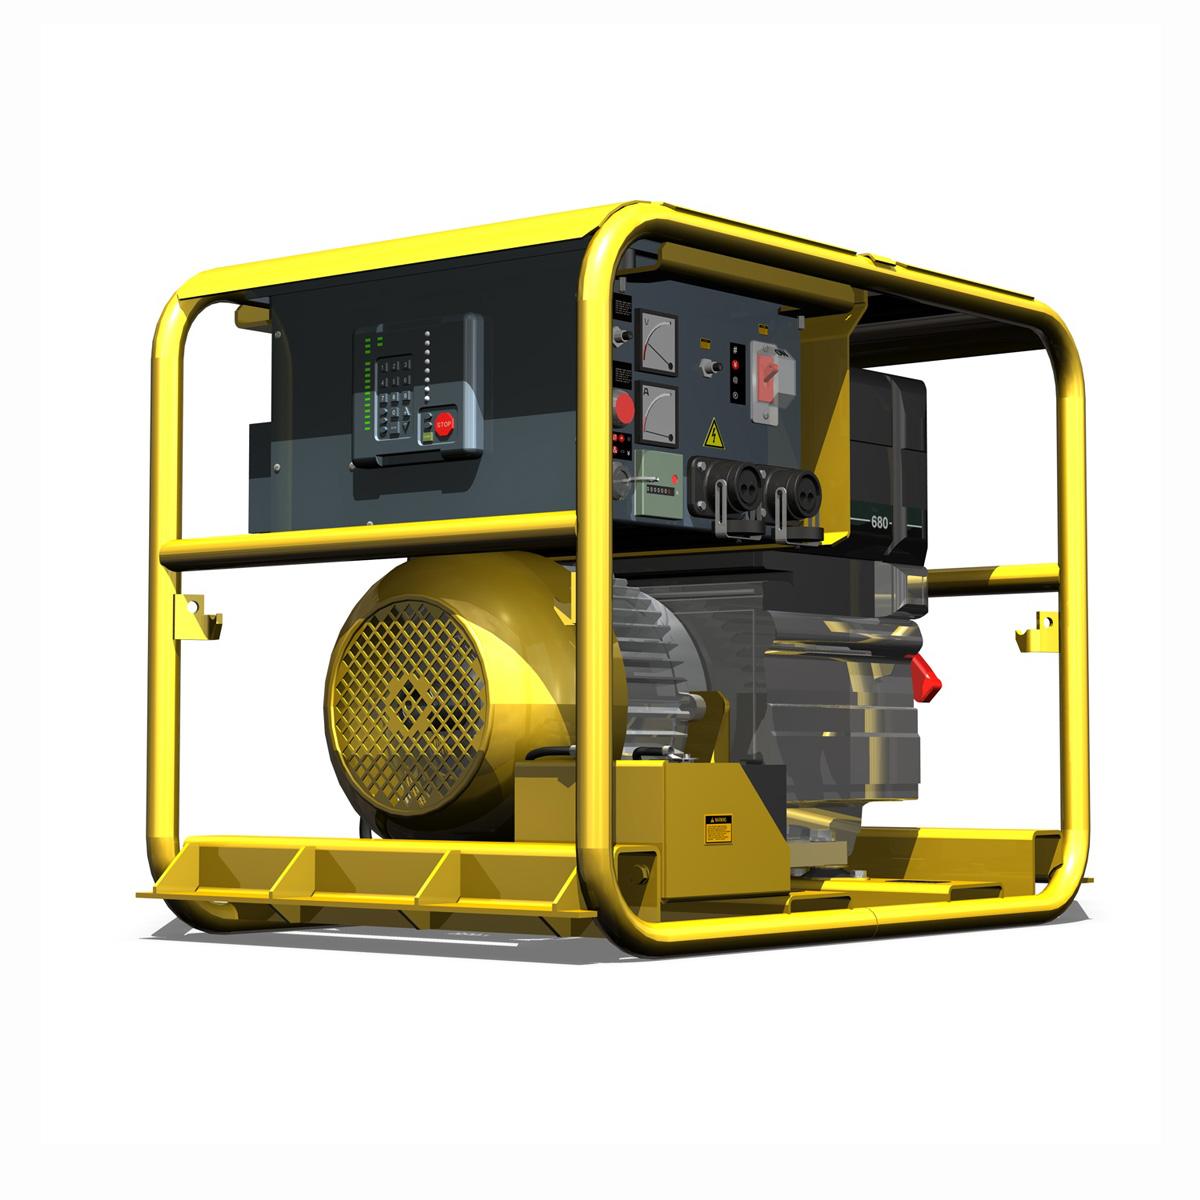 diesel generator 3d model 3ds fbx c4d lwo obj 188590